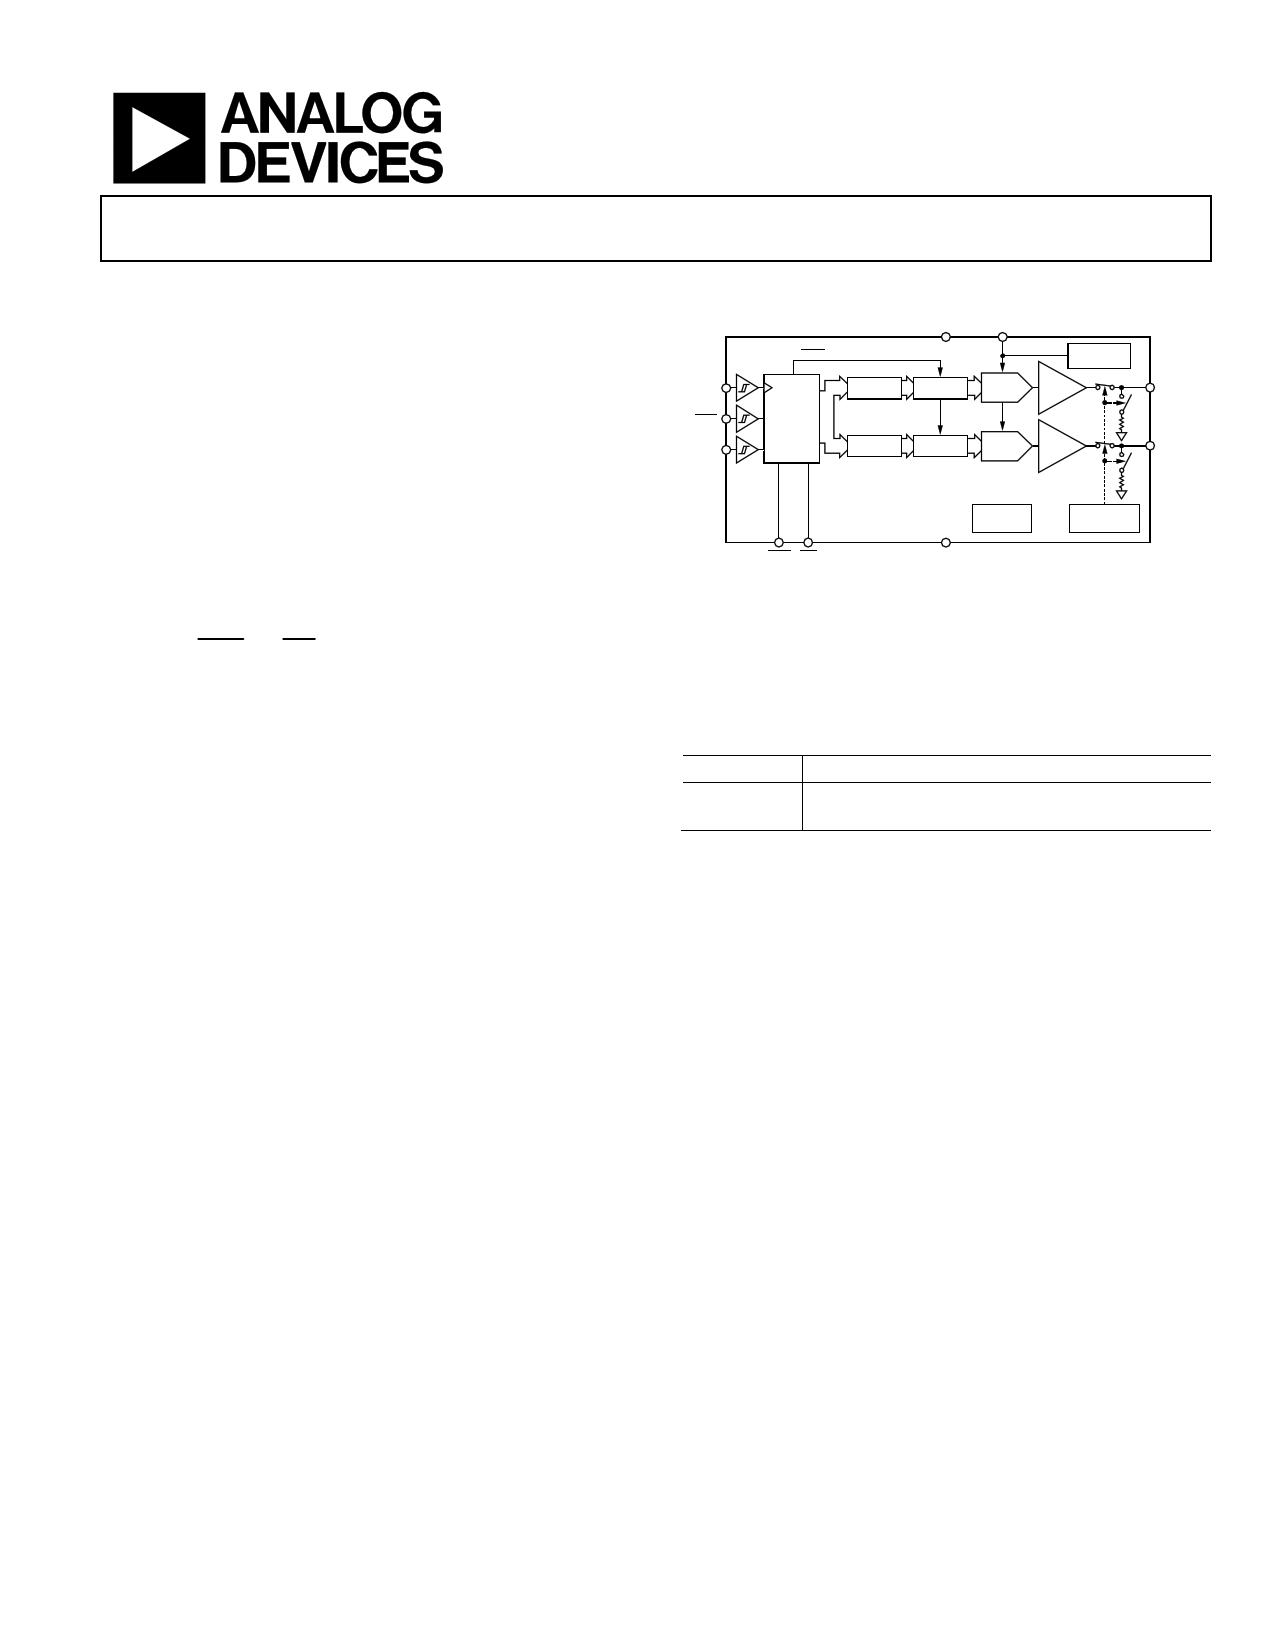 AD5663R datasheet